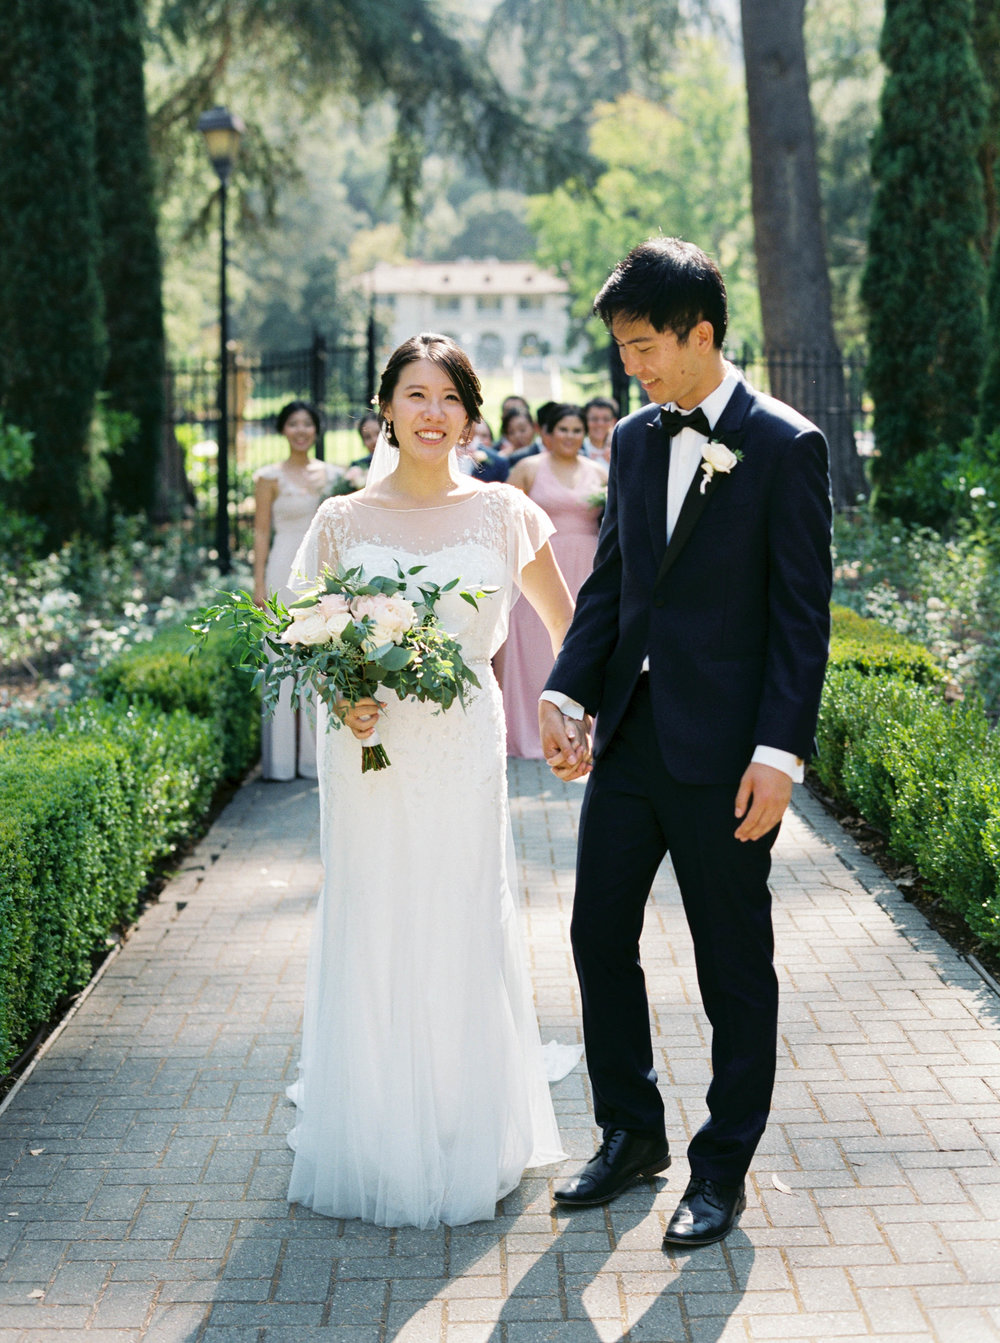 Villa_Montalvo_Wedding_Photographer_Videographer_San_Francisco072.jpg